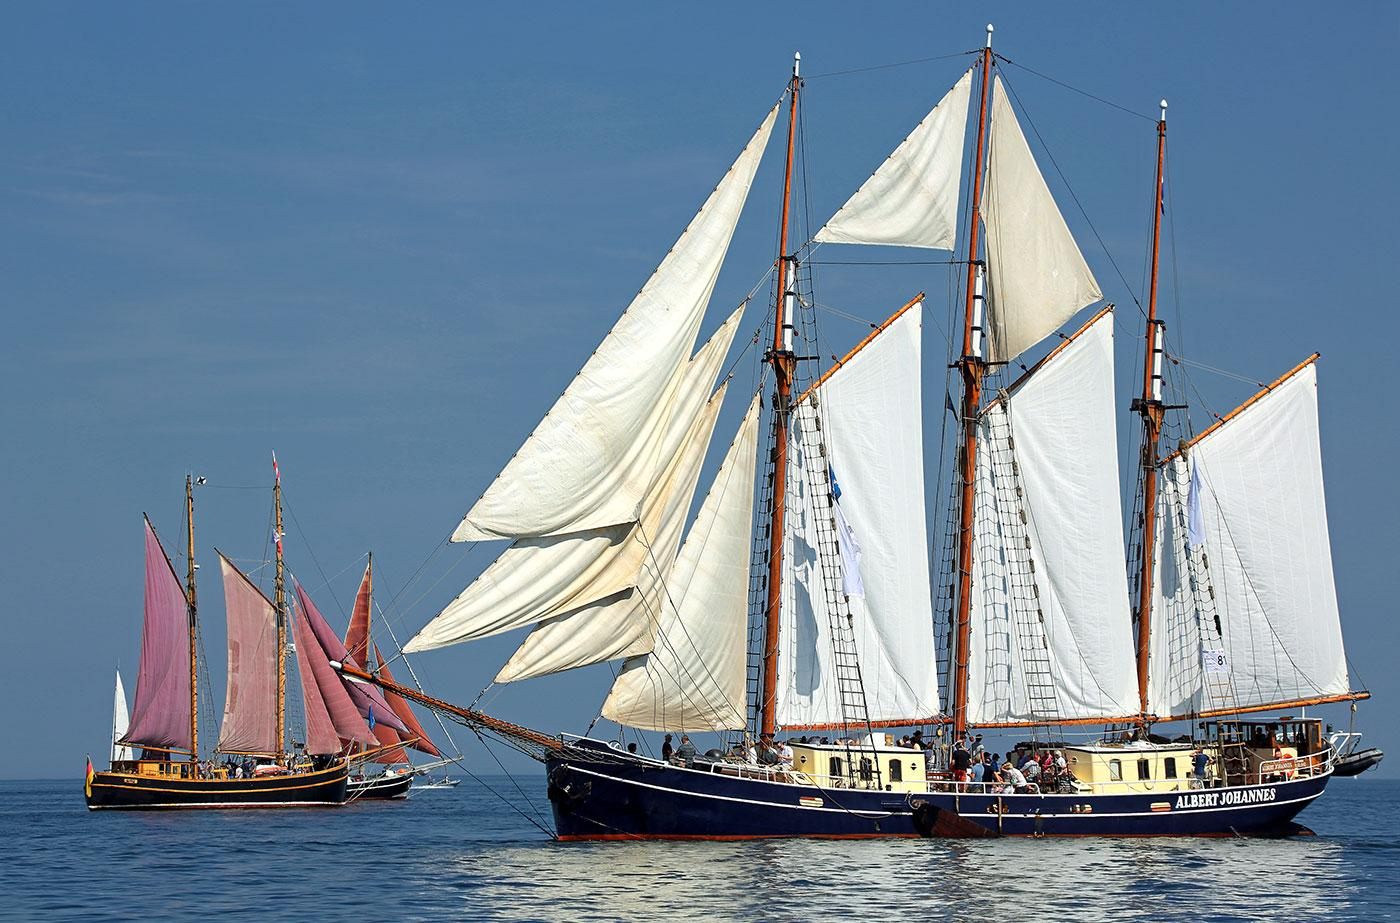 Dutch old-fashioned schooner